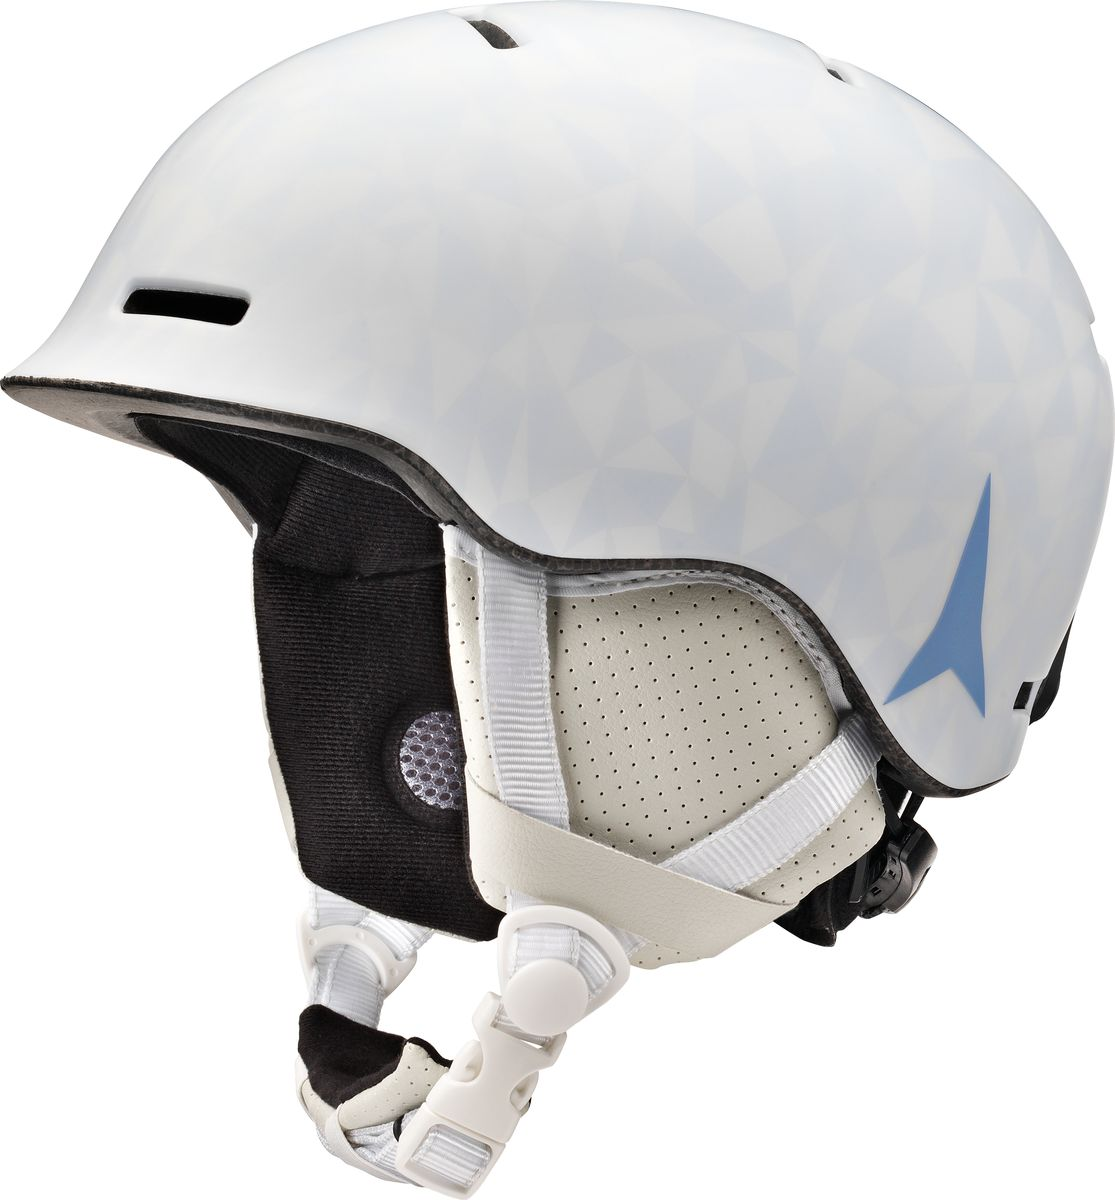 Шлем горнолыжный Atomic Mentor Jr, цвет: белый. Размер S (53-56)